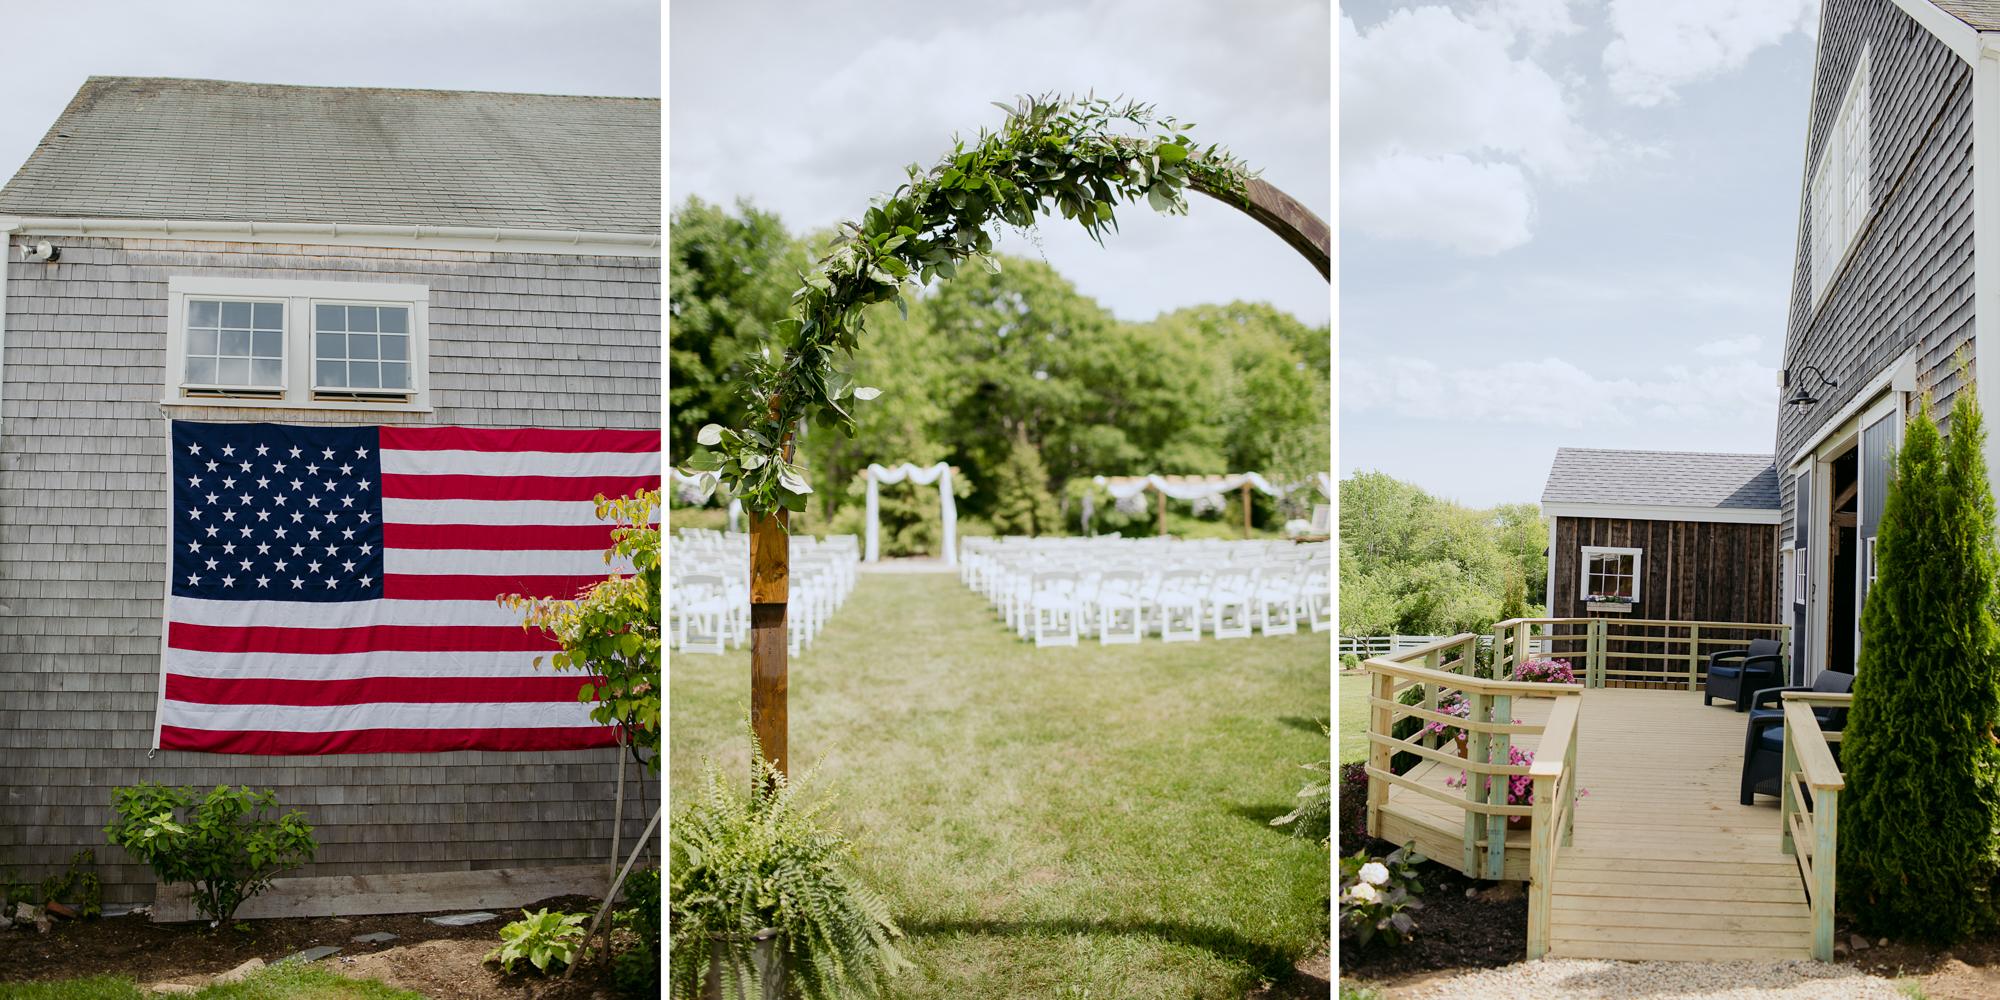 Livewell_Farm_wedding_Harpswell_maine_Meghan_Jim_001.jpg